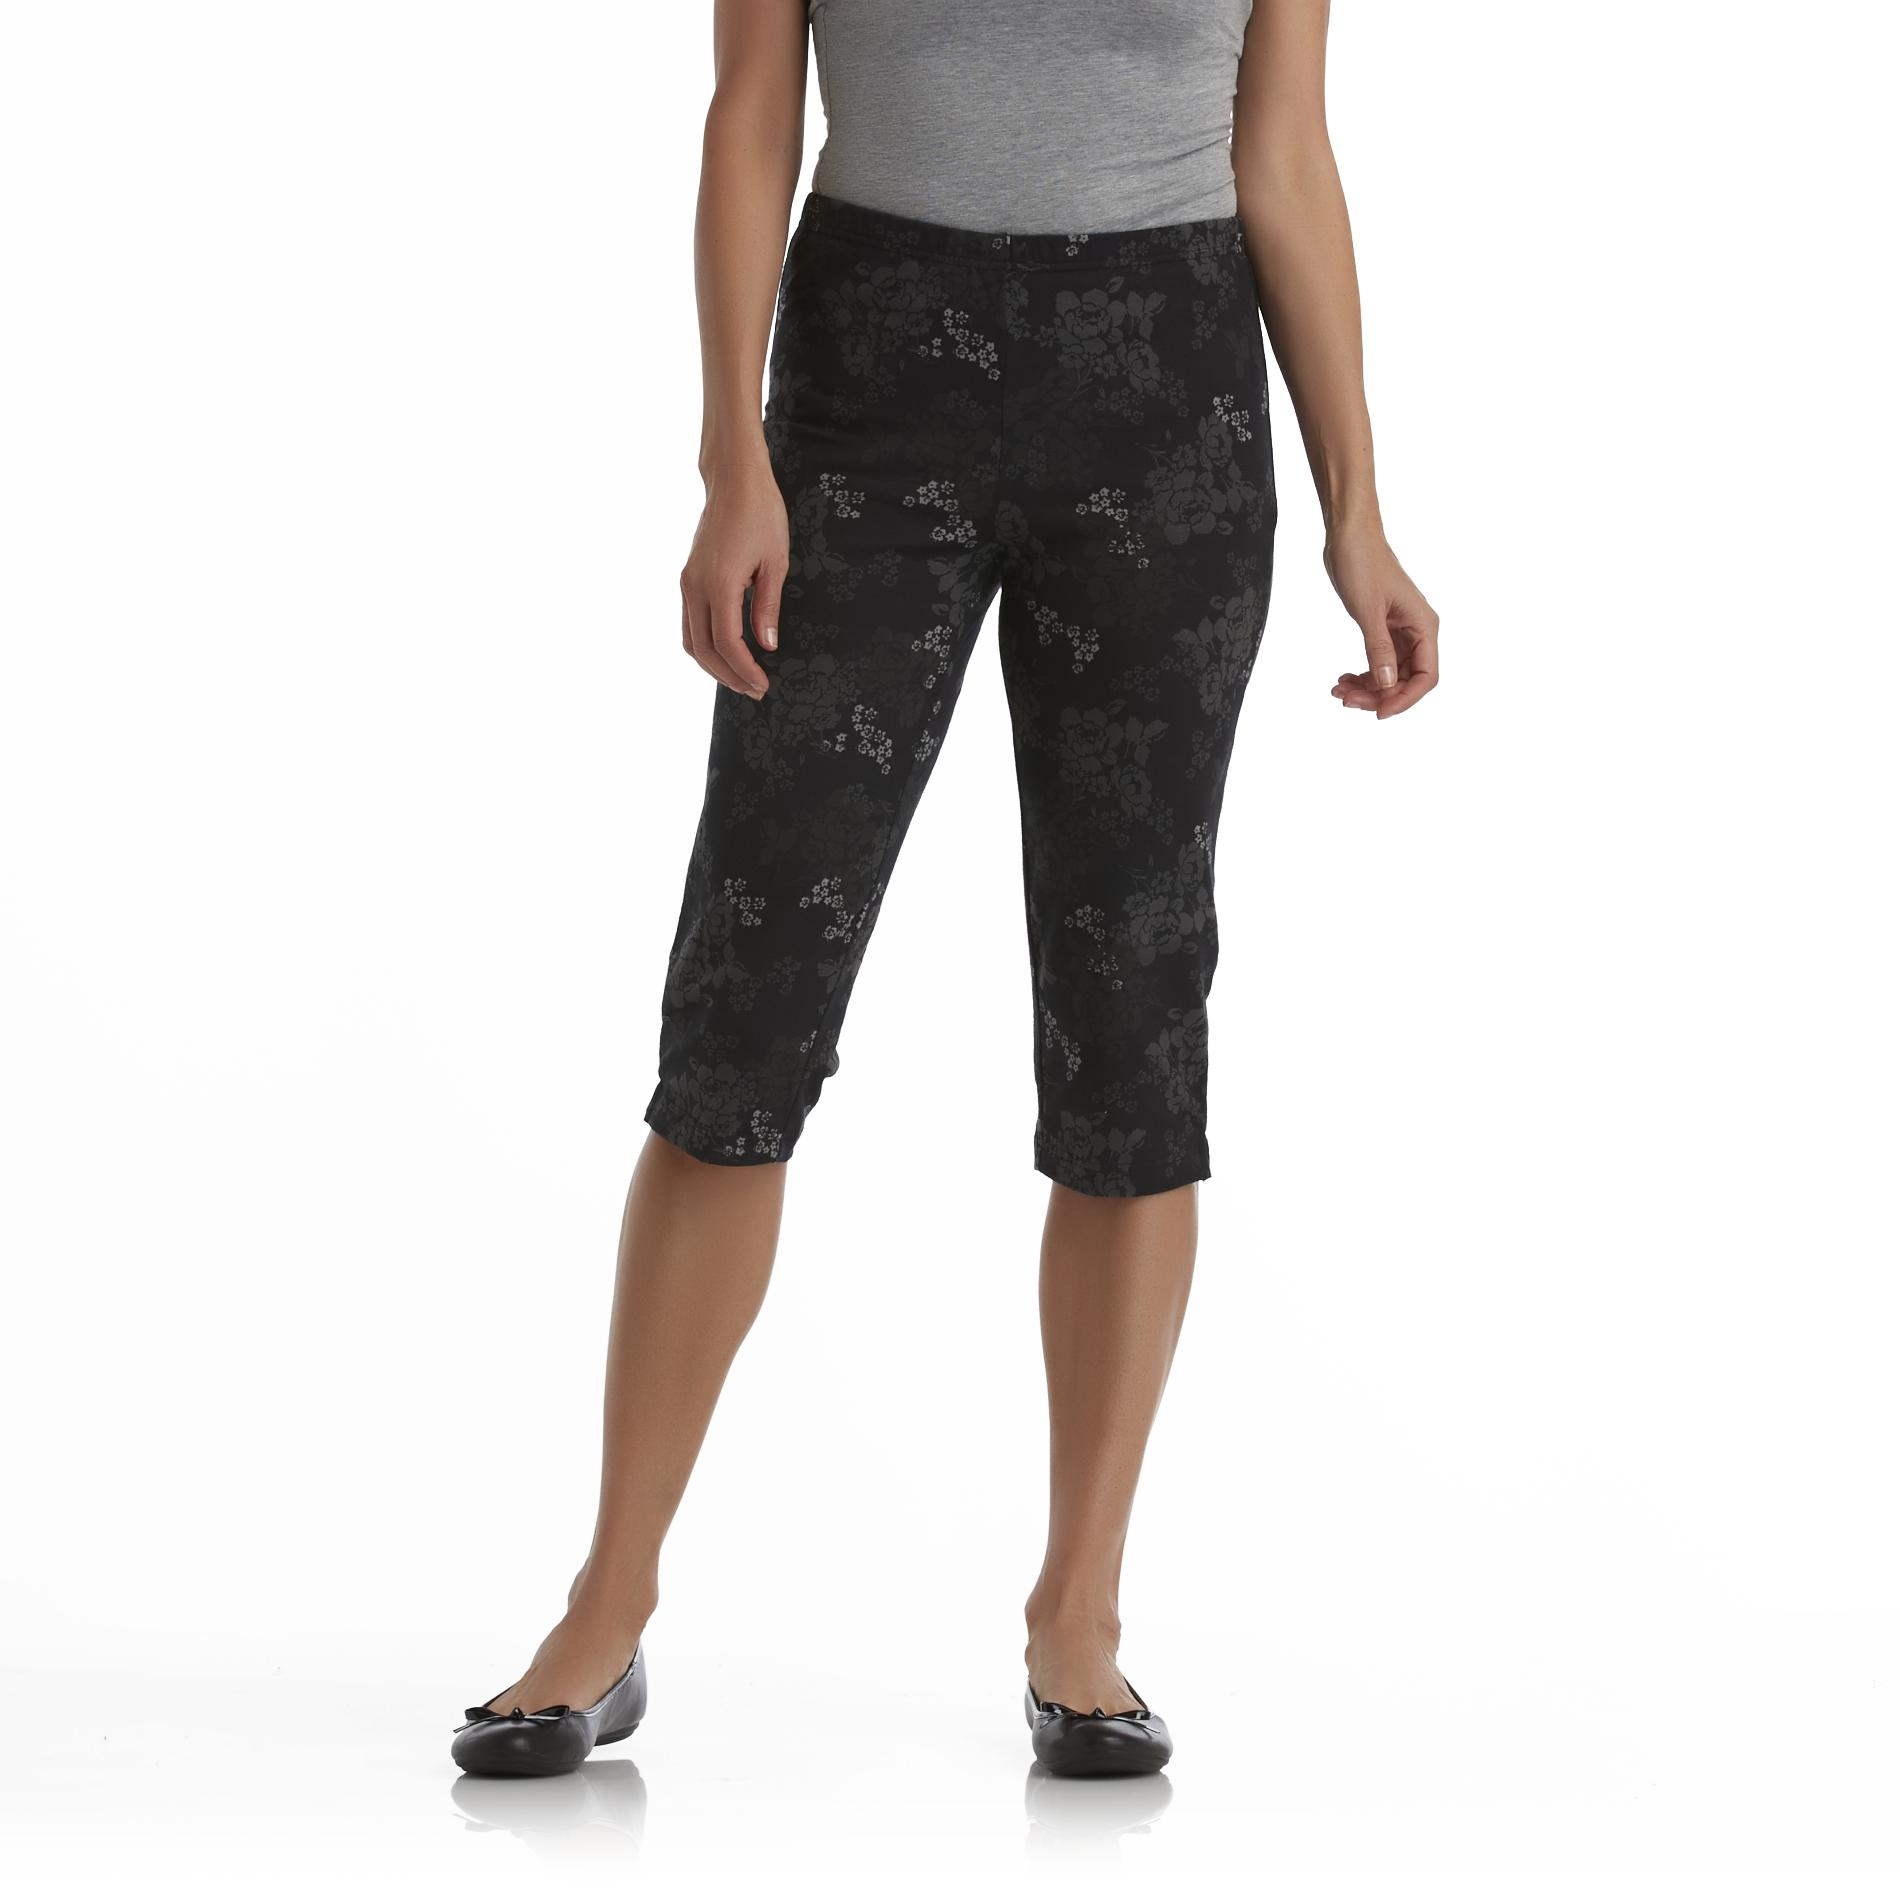 Basic Editions Capris Pants Women